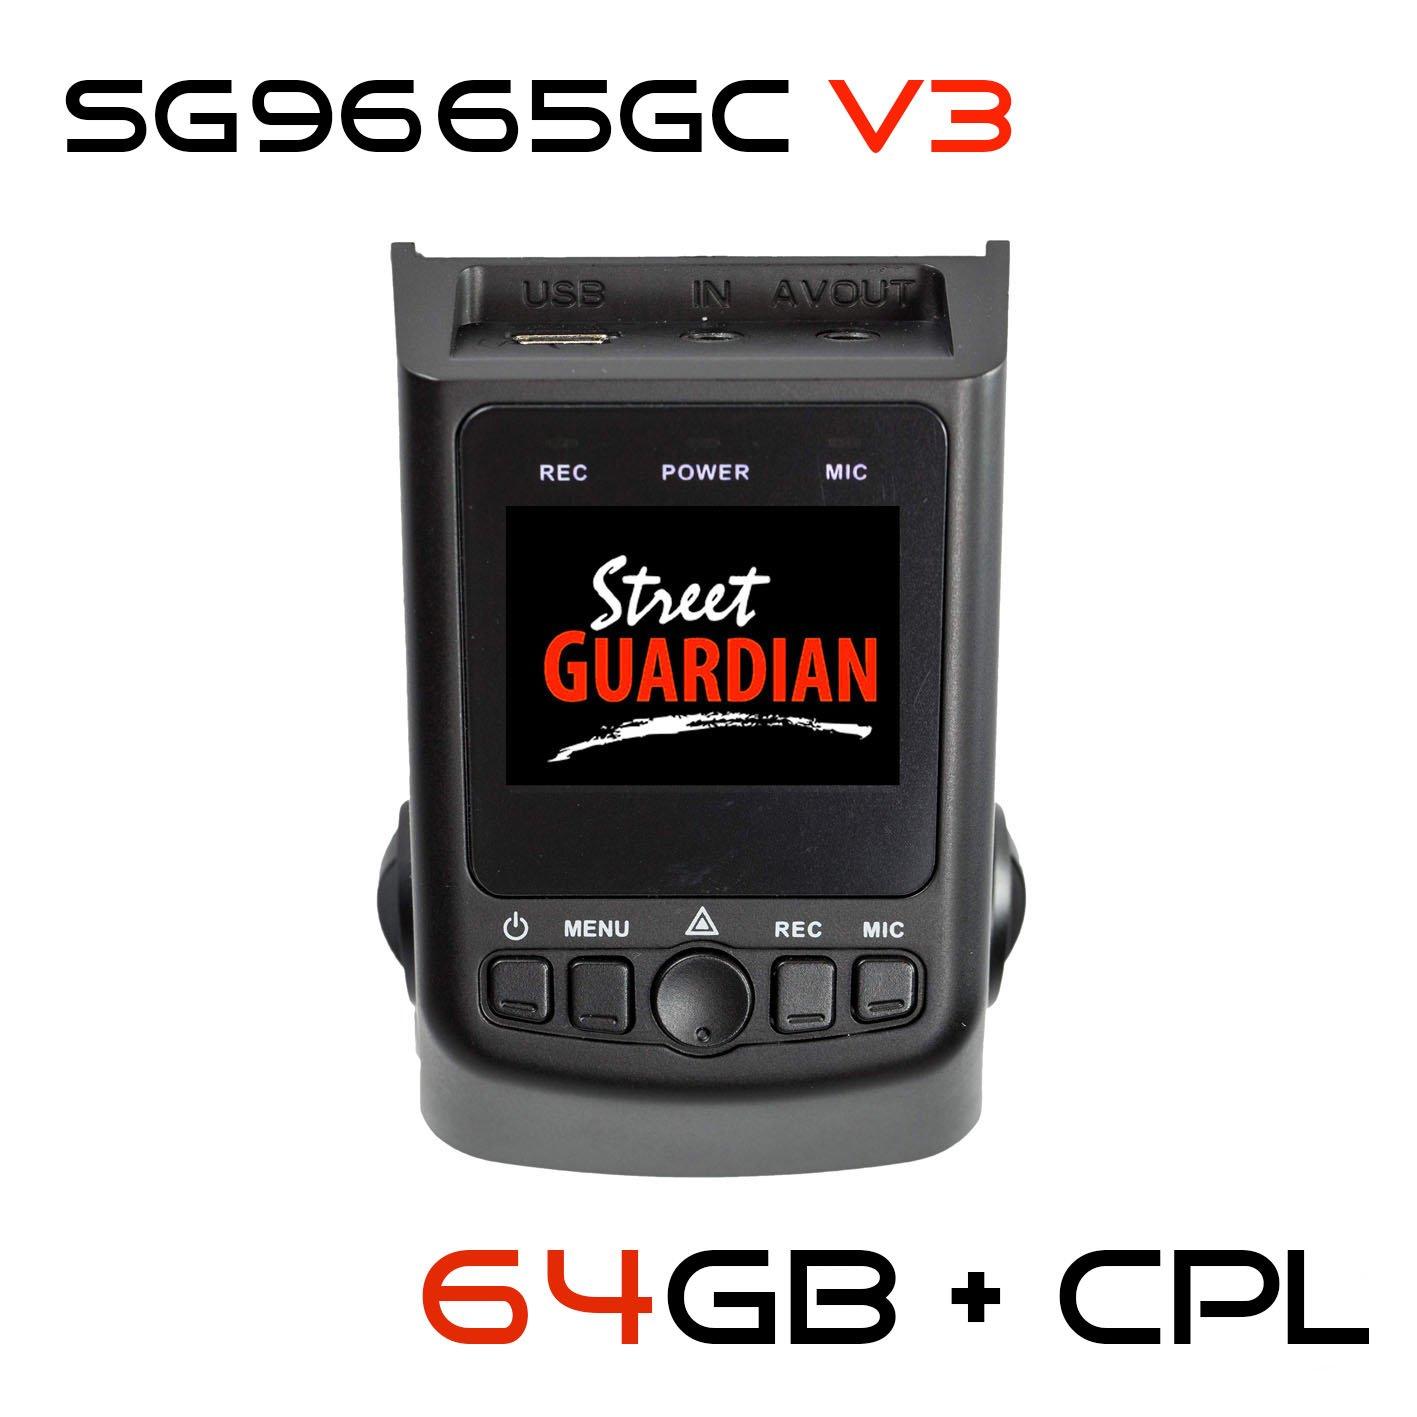 SG9665GC V3 64GB + CPL